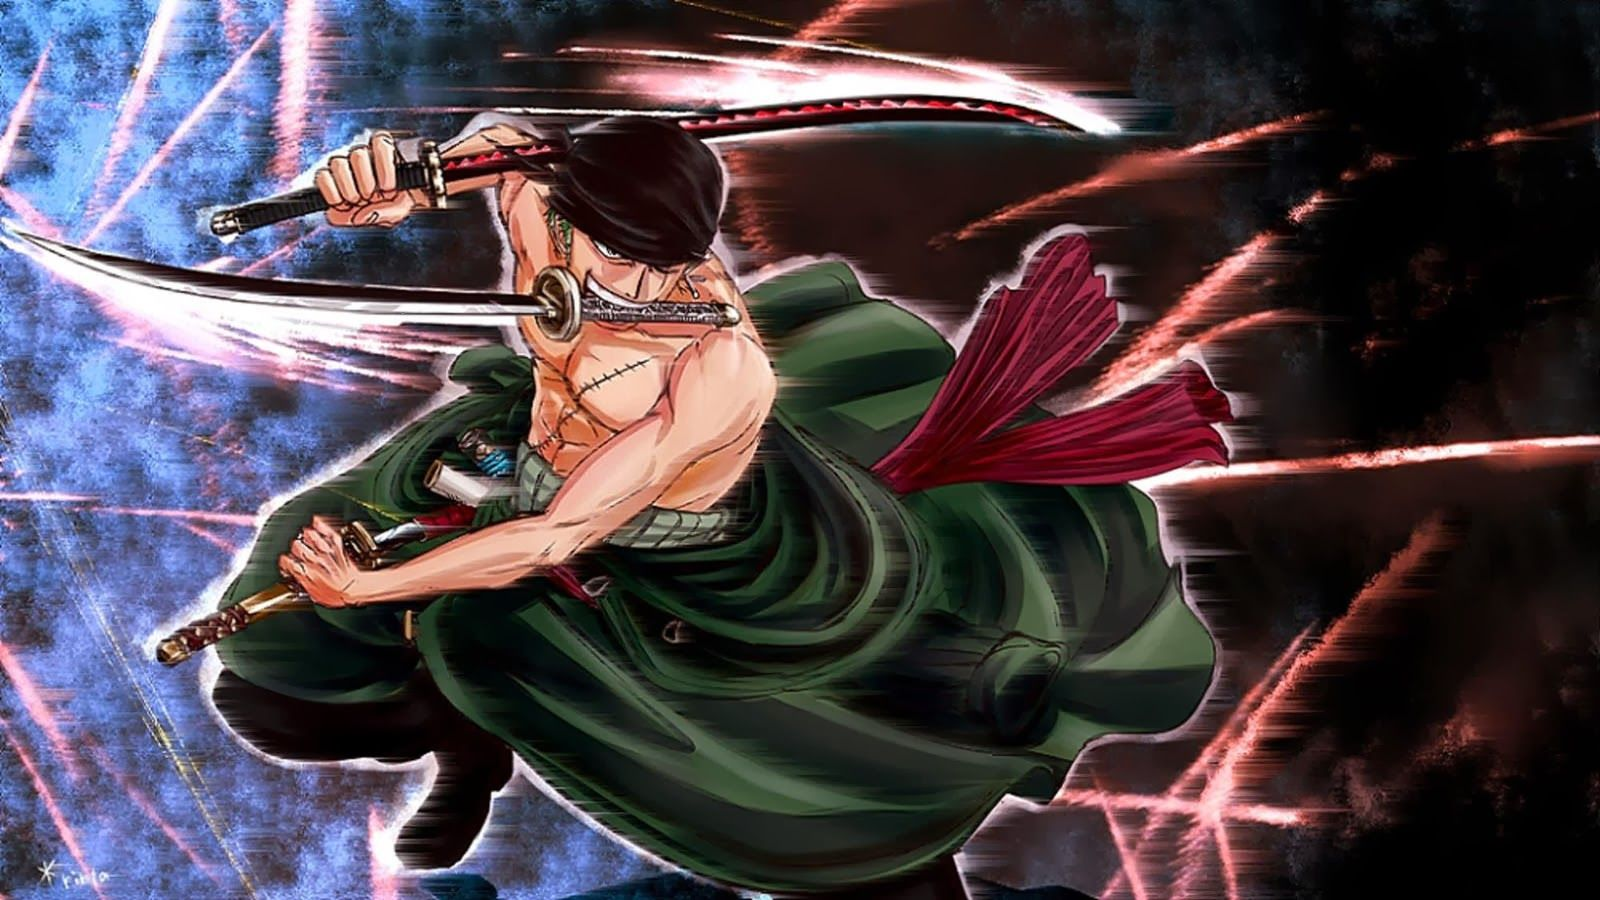 3 Sword Style Zoro One Piece 26 Hd Wallpaper Roronoa Zoro Anime Zoro